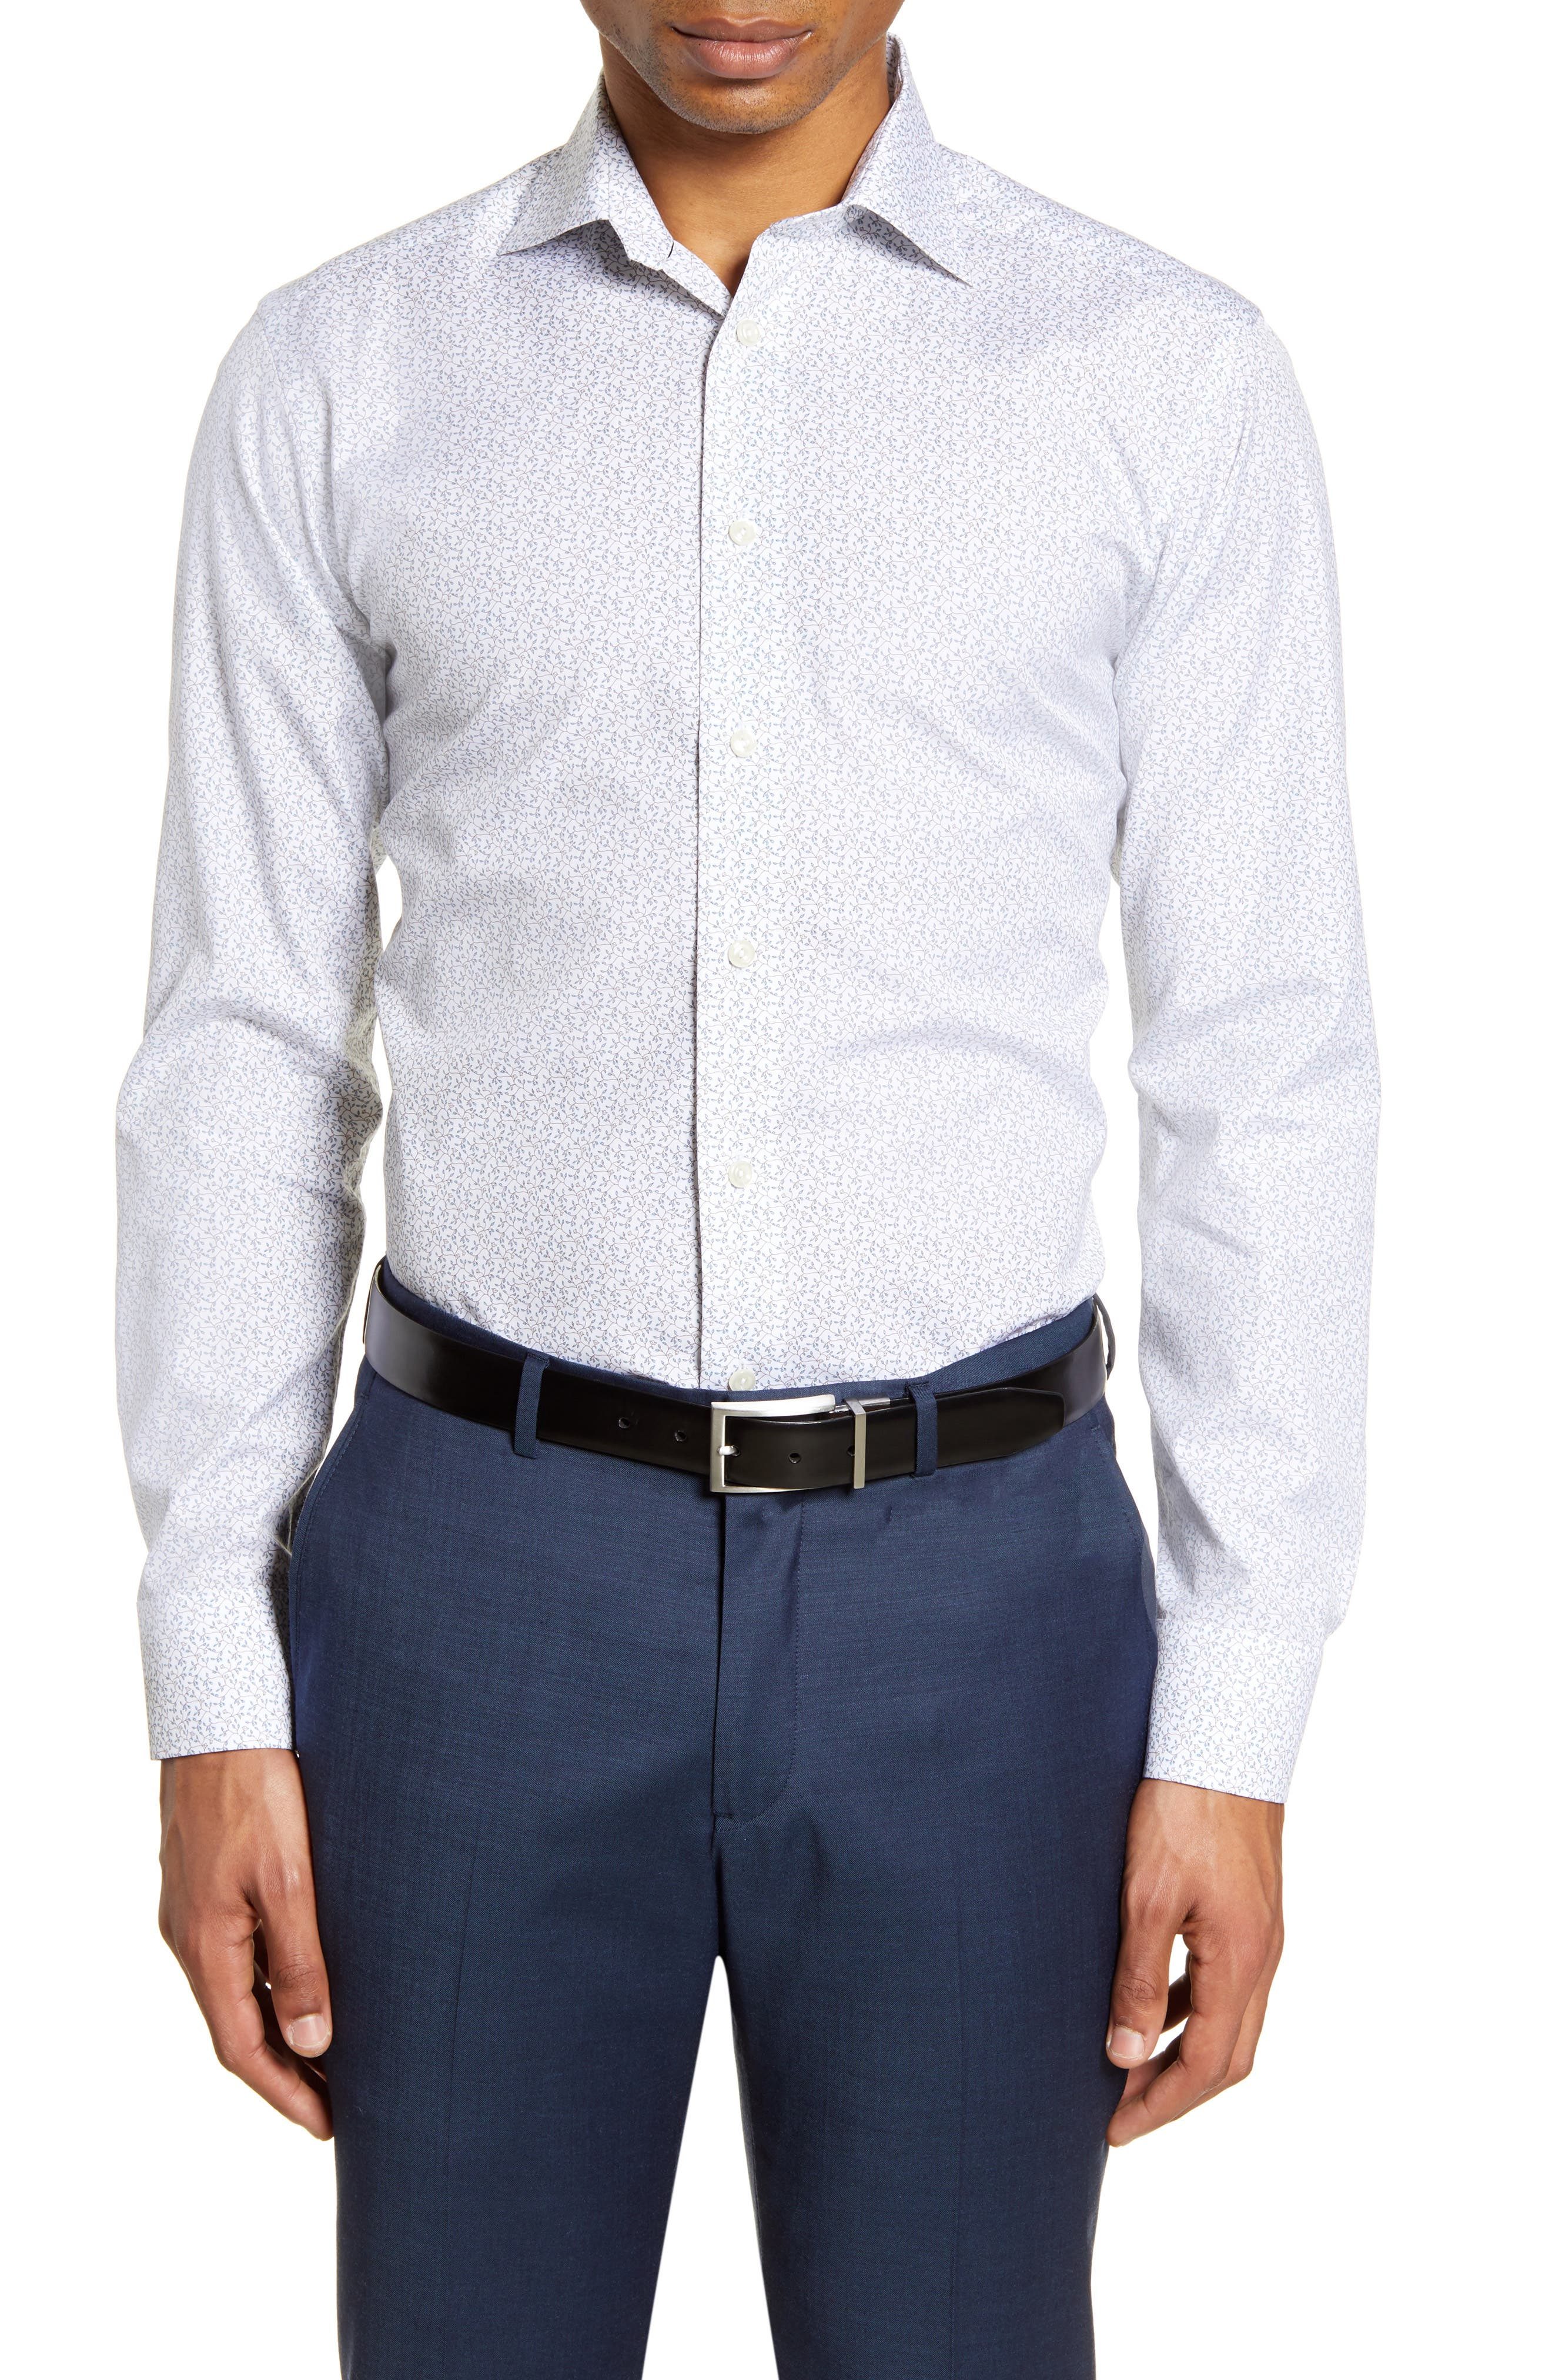 Image of Eton Slim Fit Floral Dress Shirt